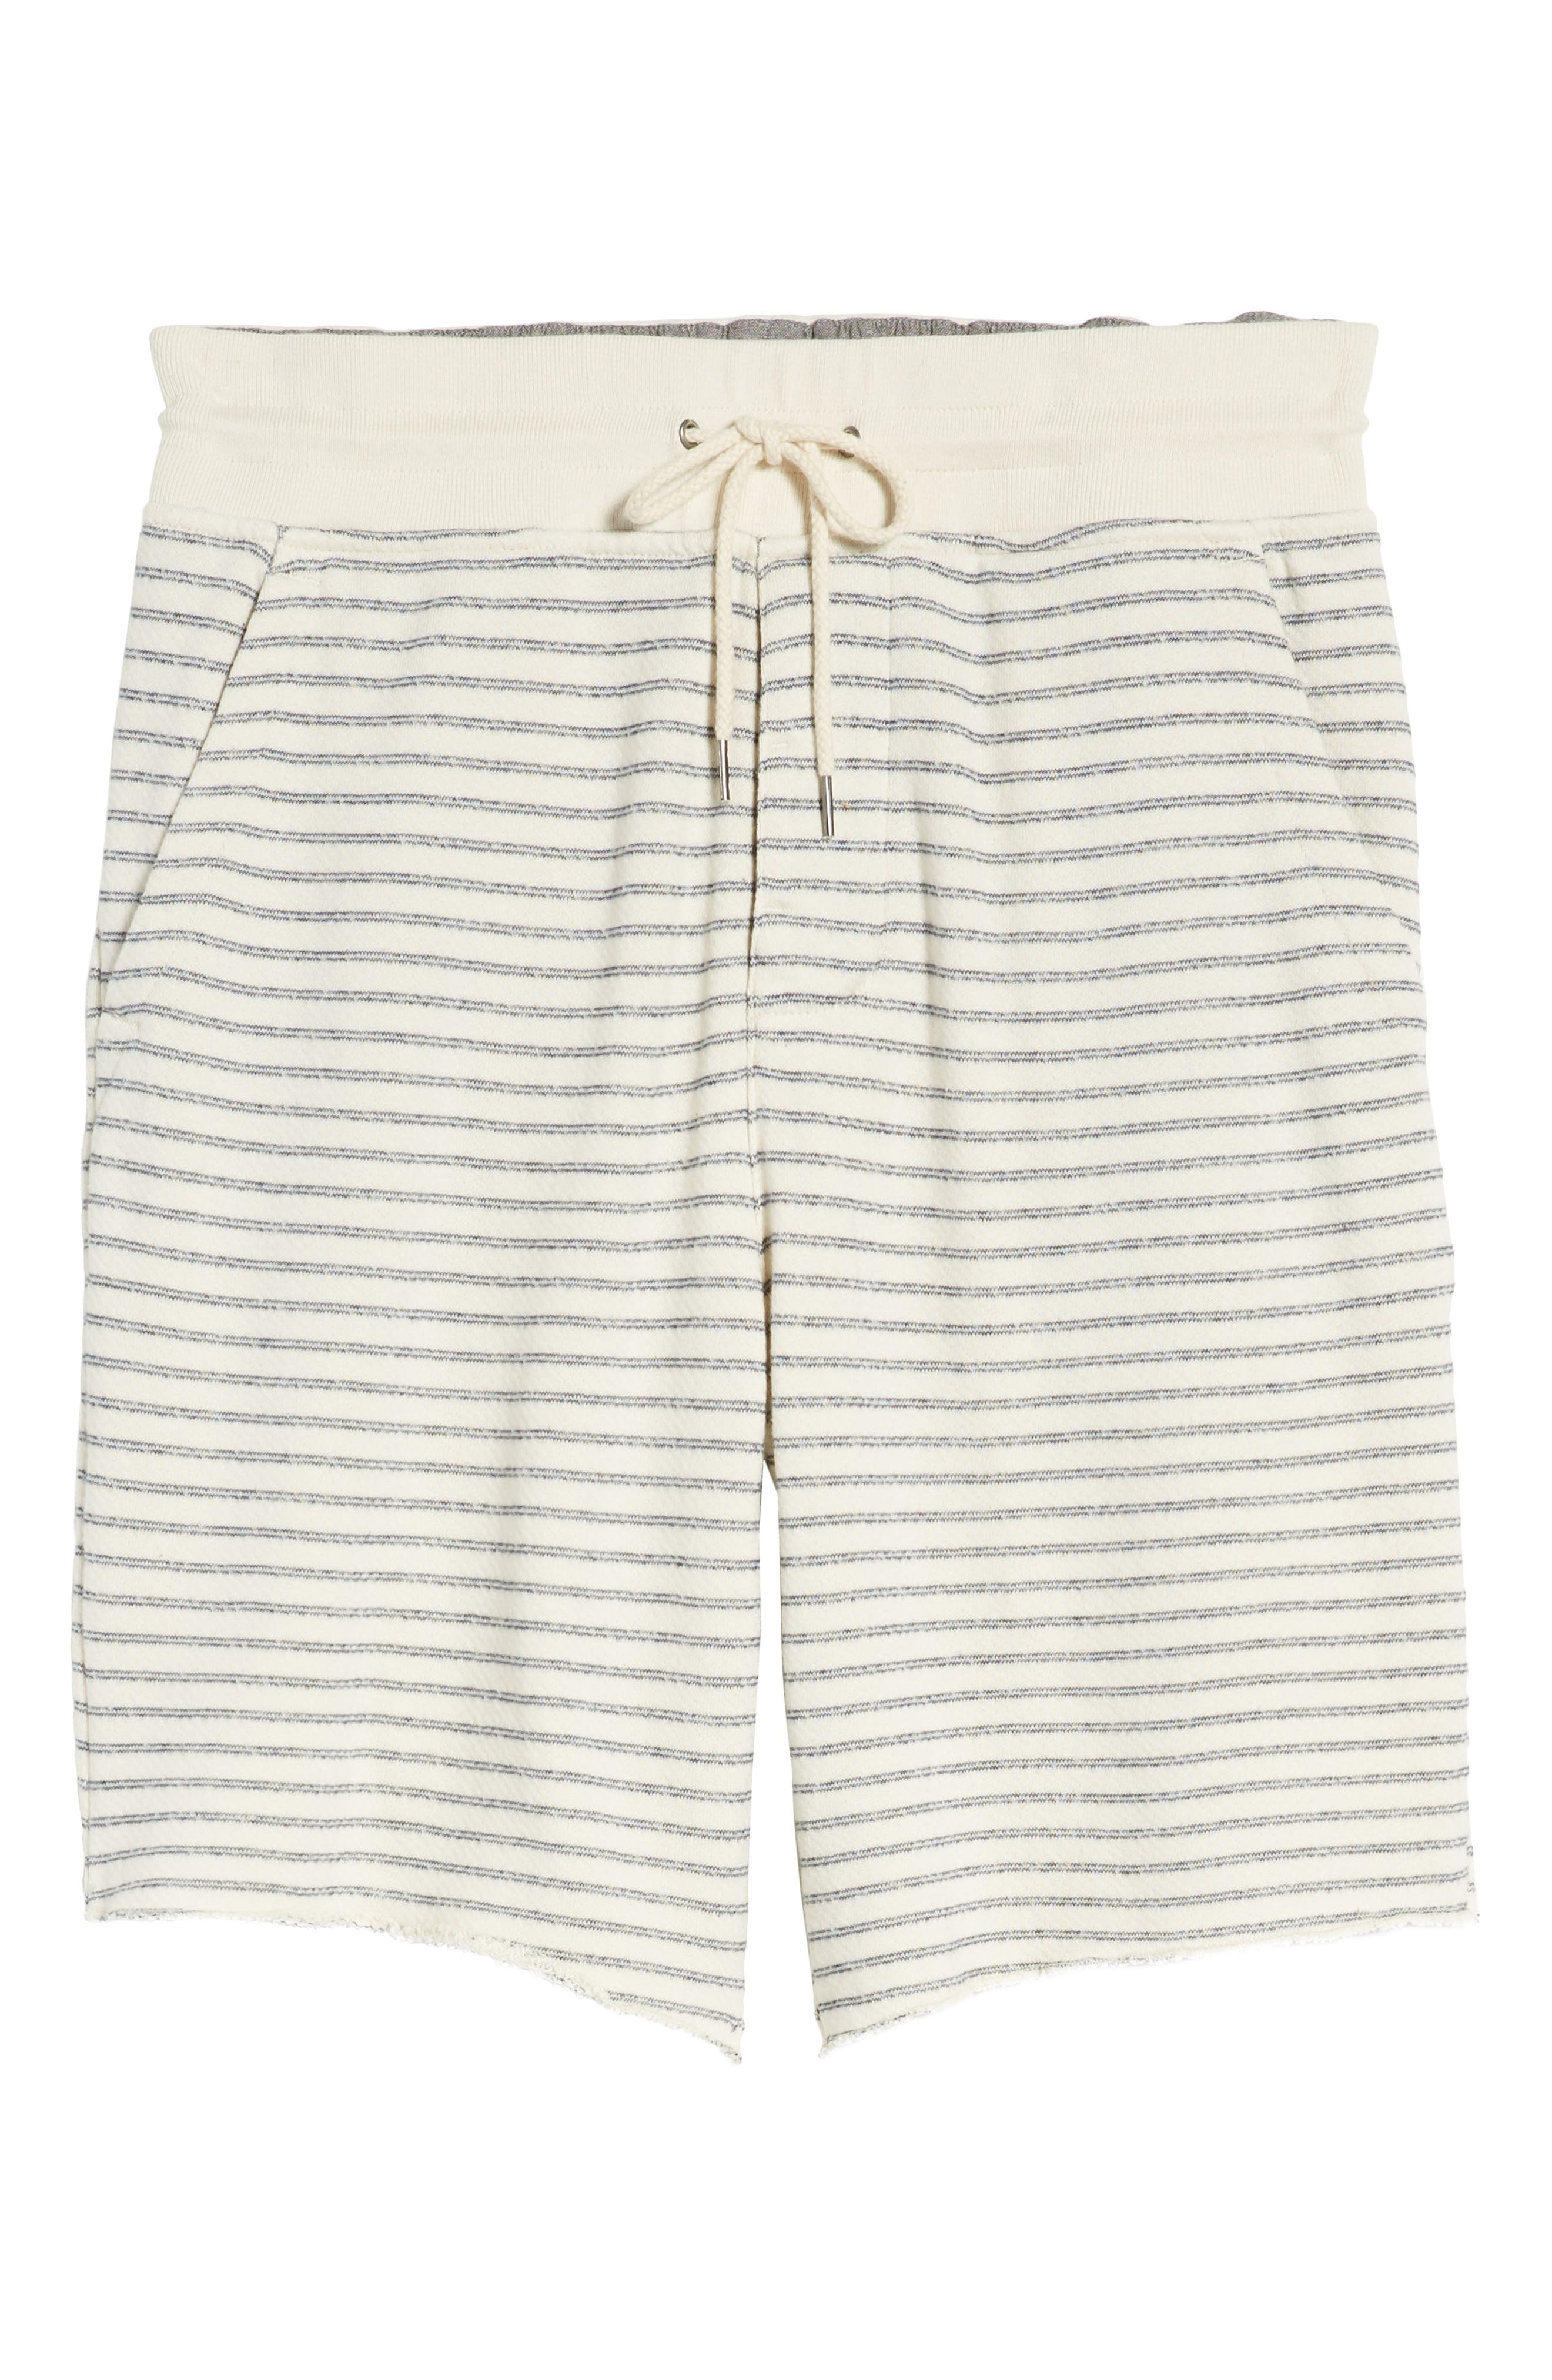 Dalton Stripe Drawcord Terry Shorts,                             Alternate thumbnail 6, color,                             White/ Navy Stripe